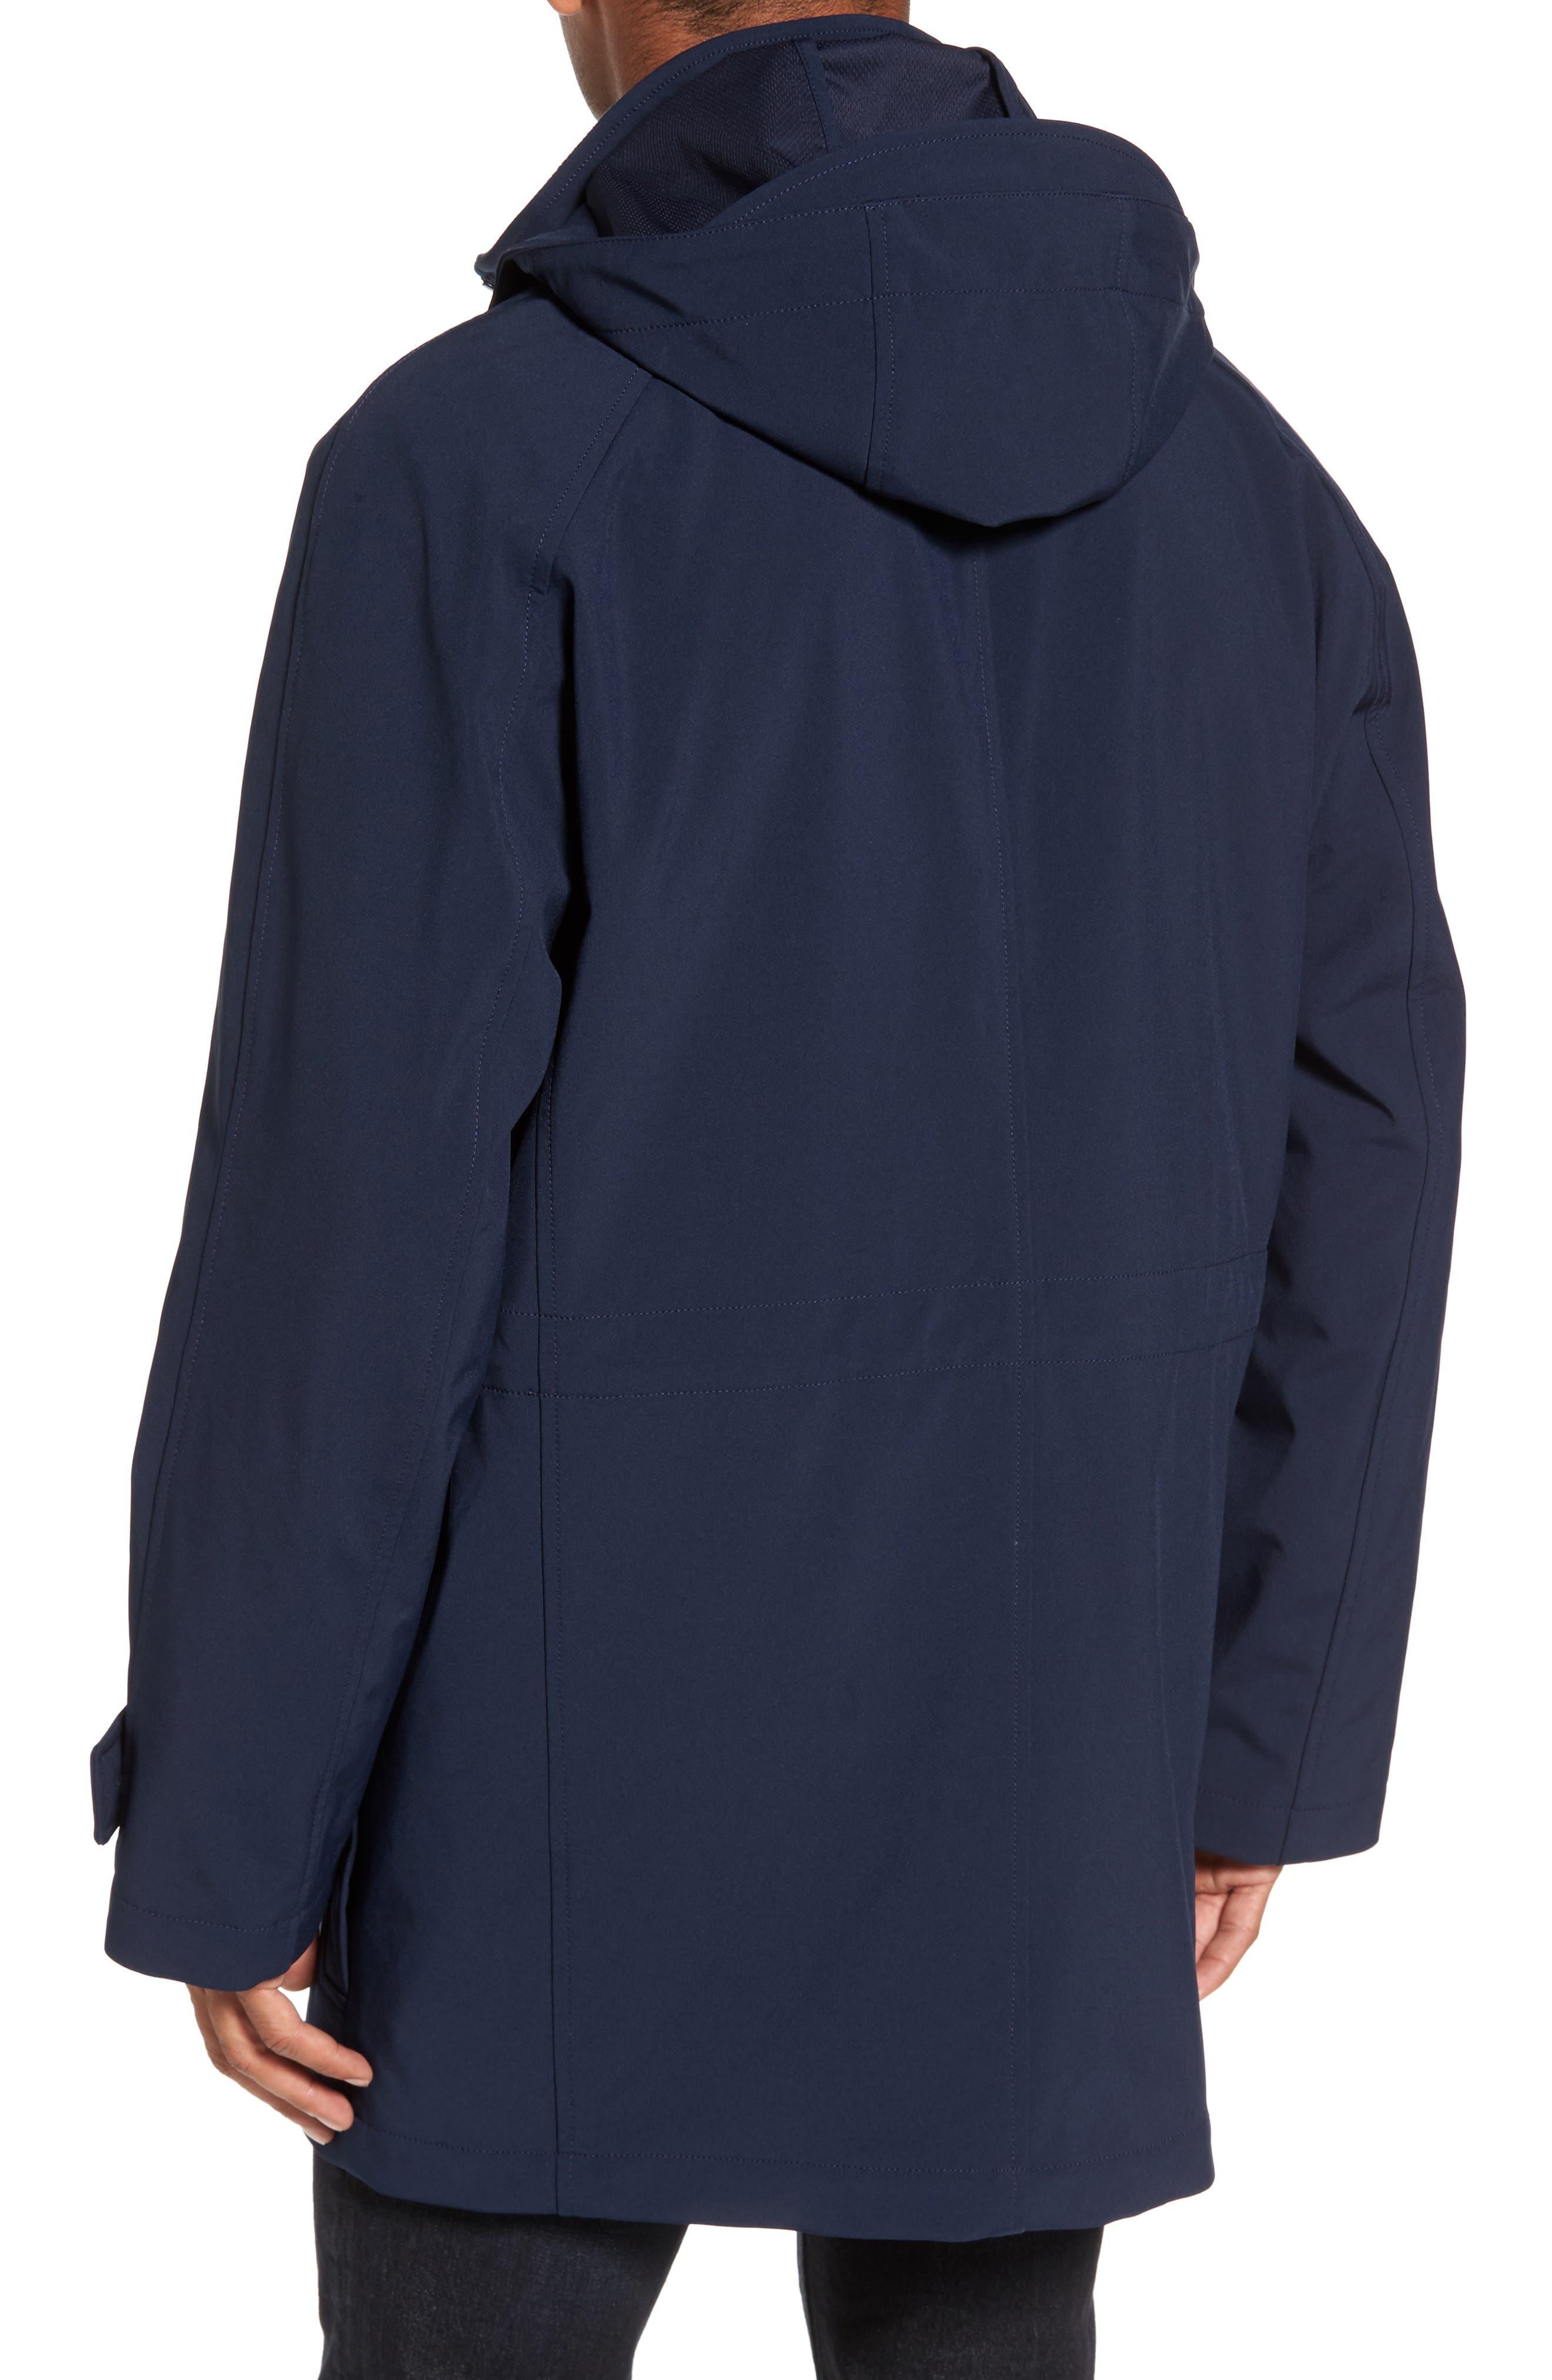 Technical Longline Jacket,                             Alternate thumbnail 2, color,                             Navy